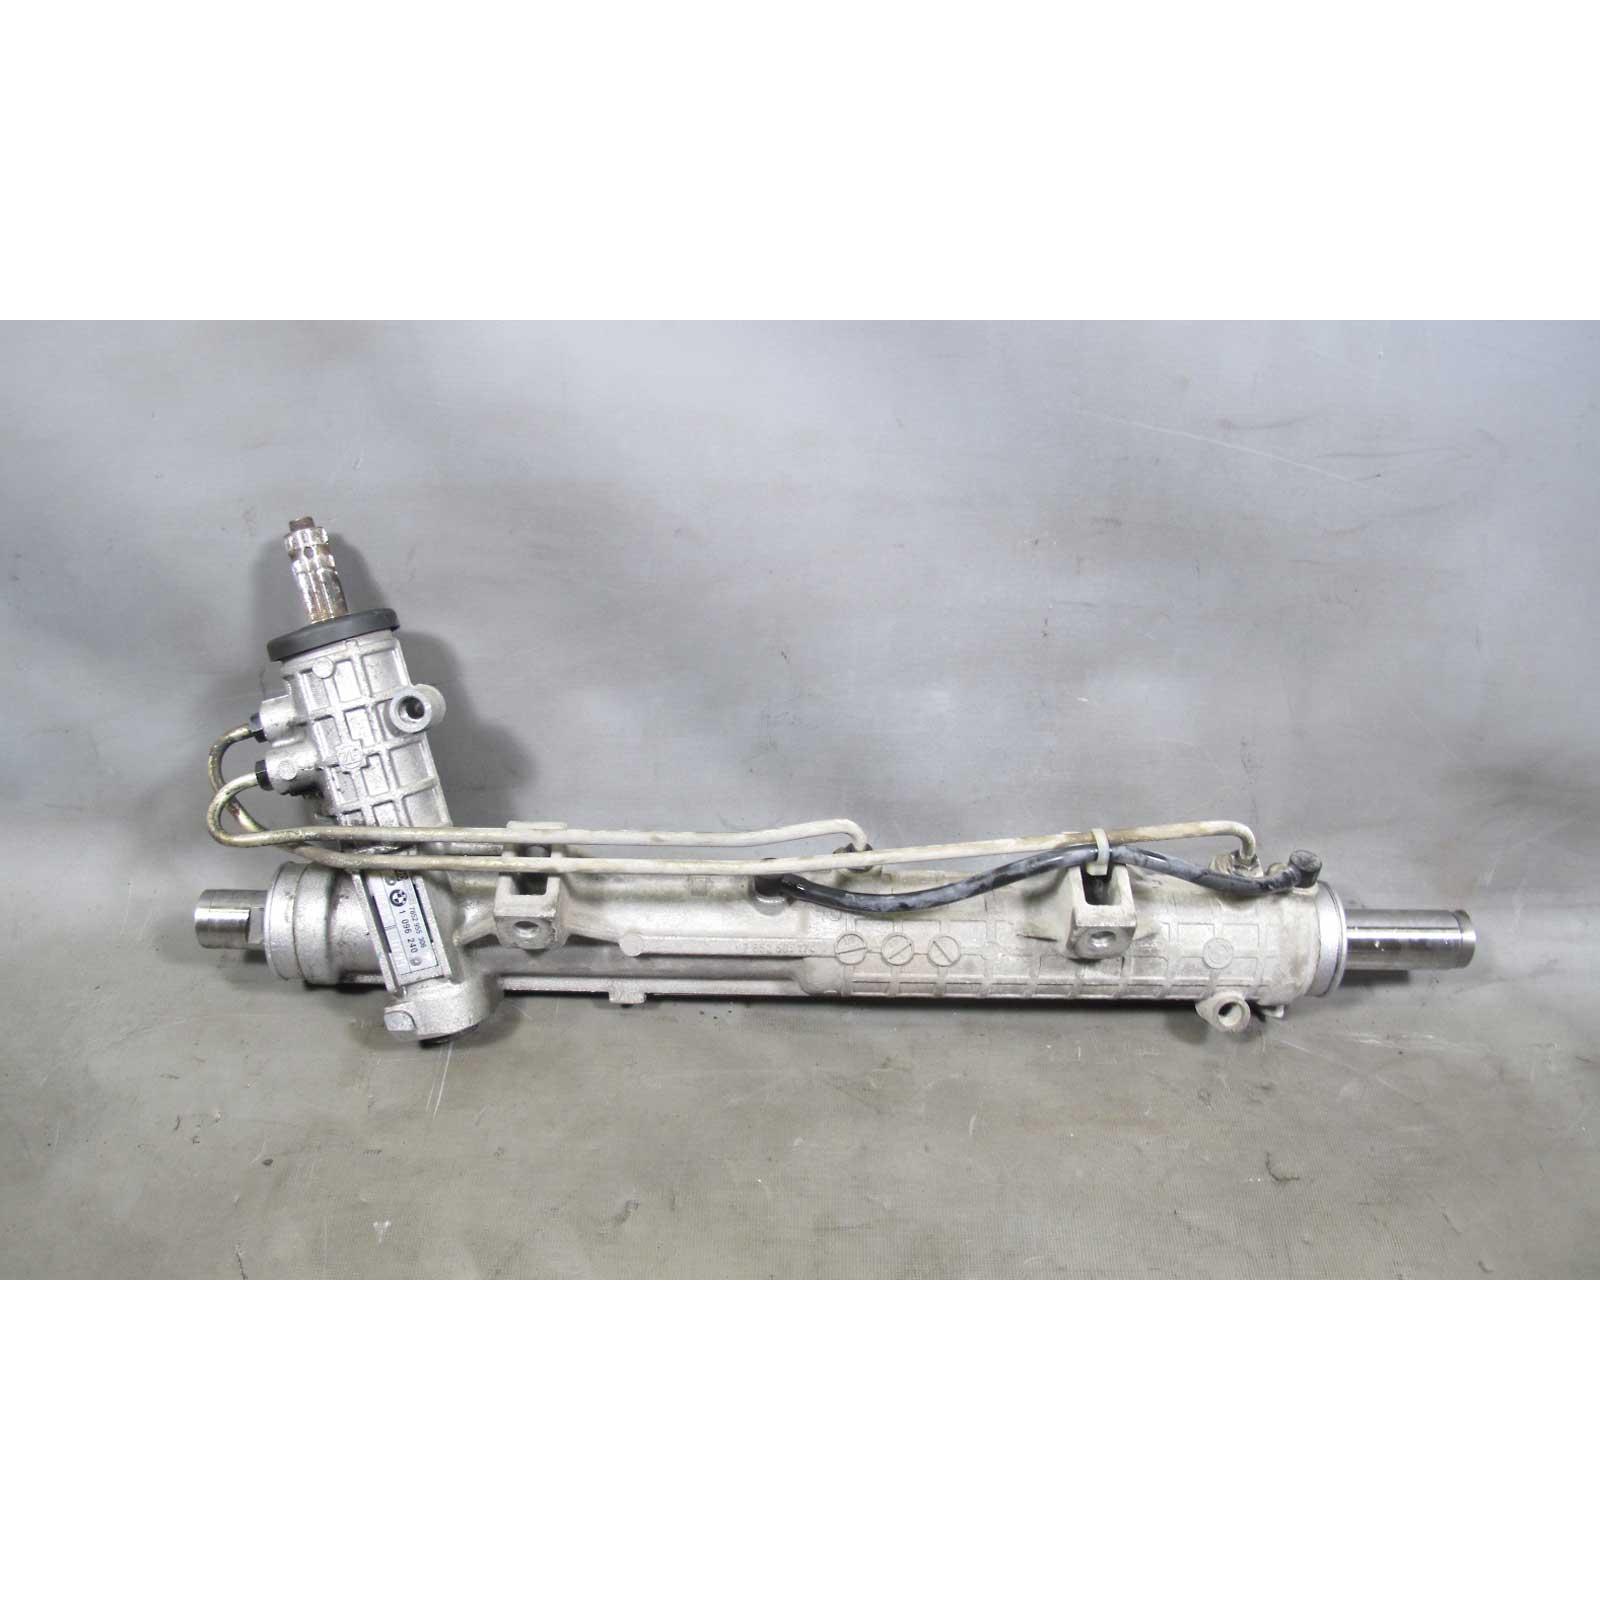 Bmw Z3 Steering Rack: BMW E36 3-Series Z3 M3.2 Factory Power Steering Rack Gear